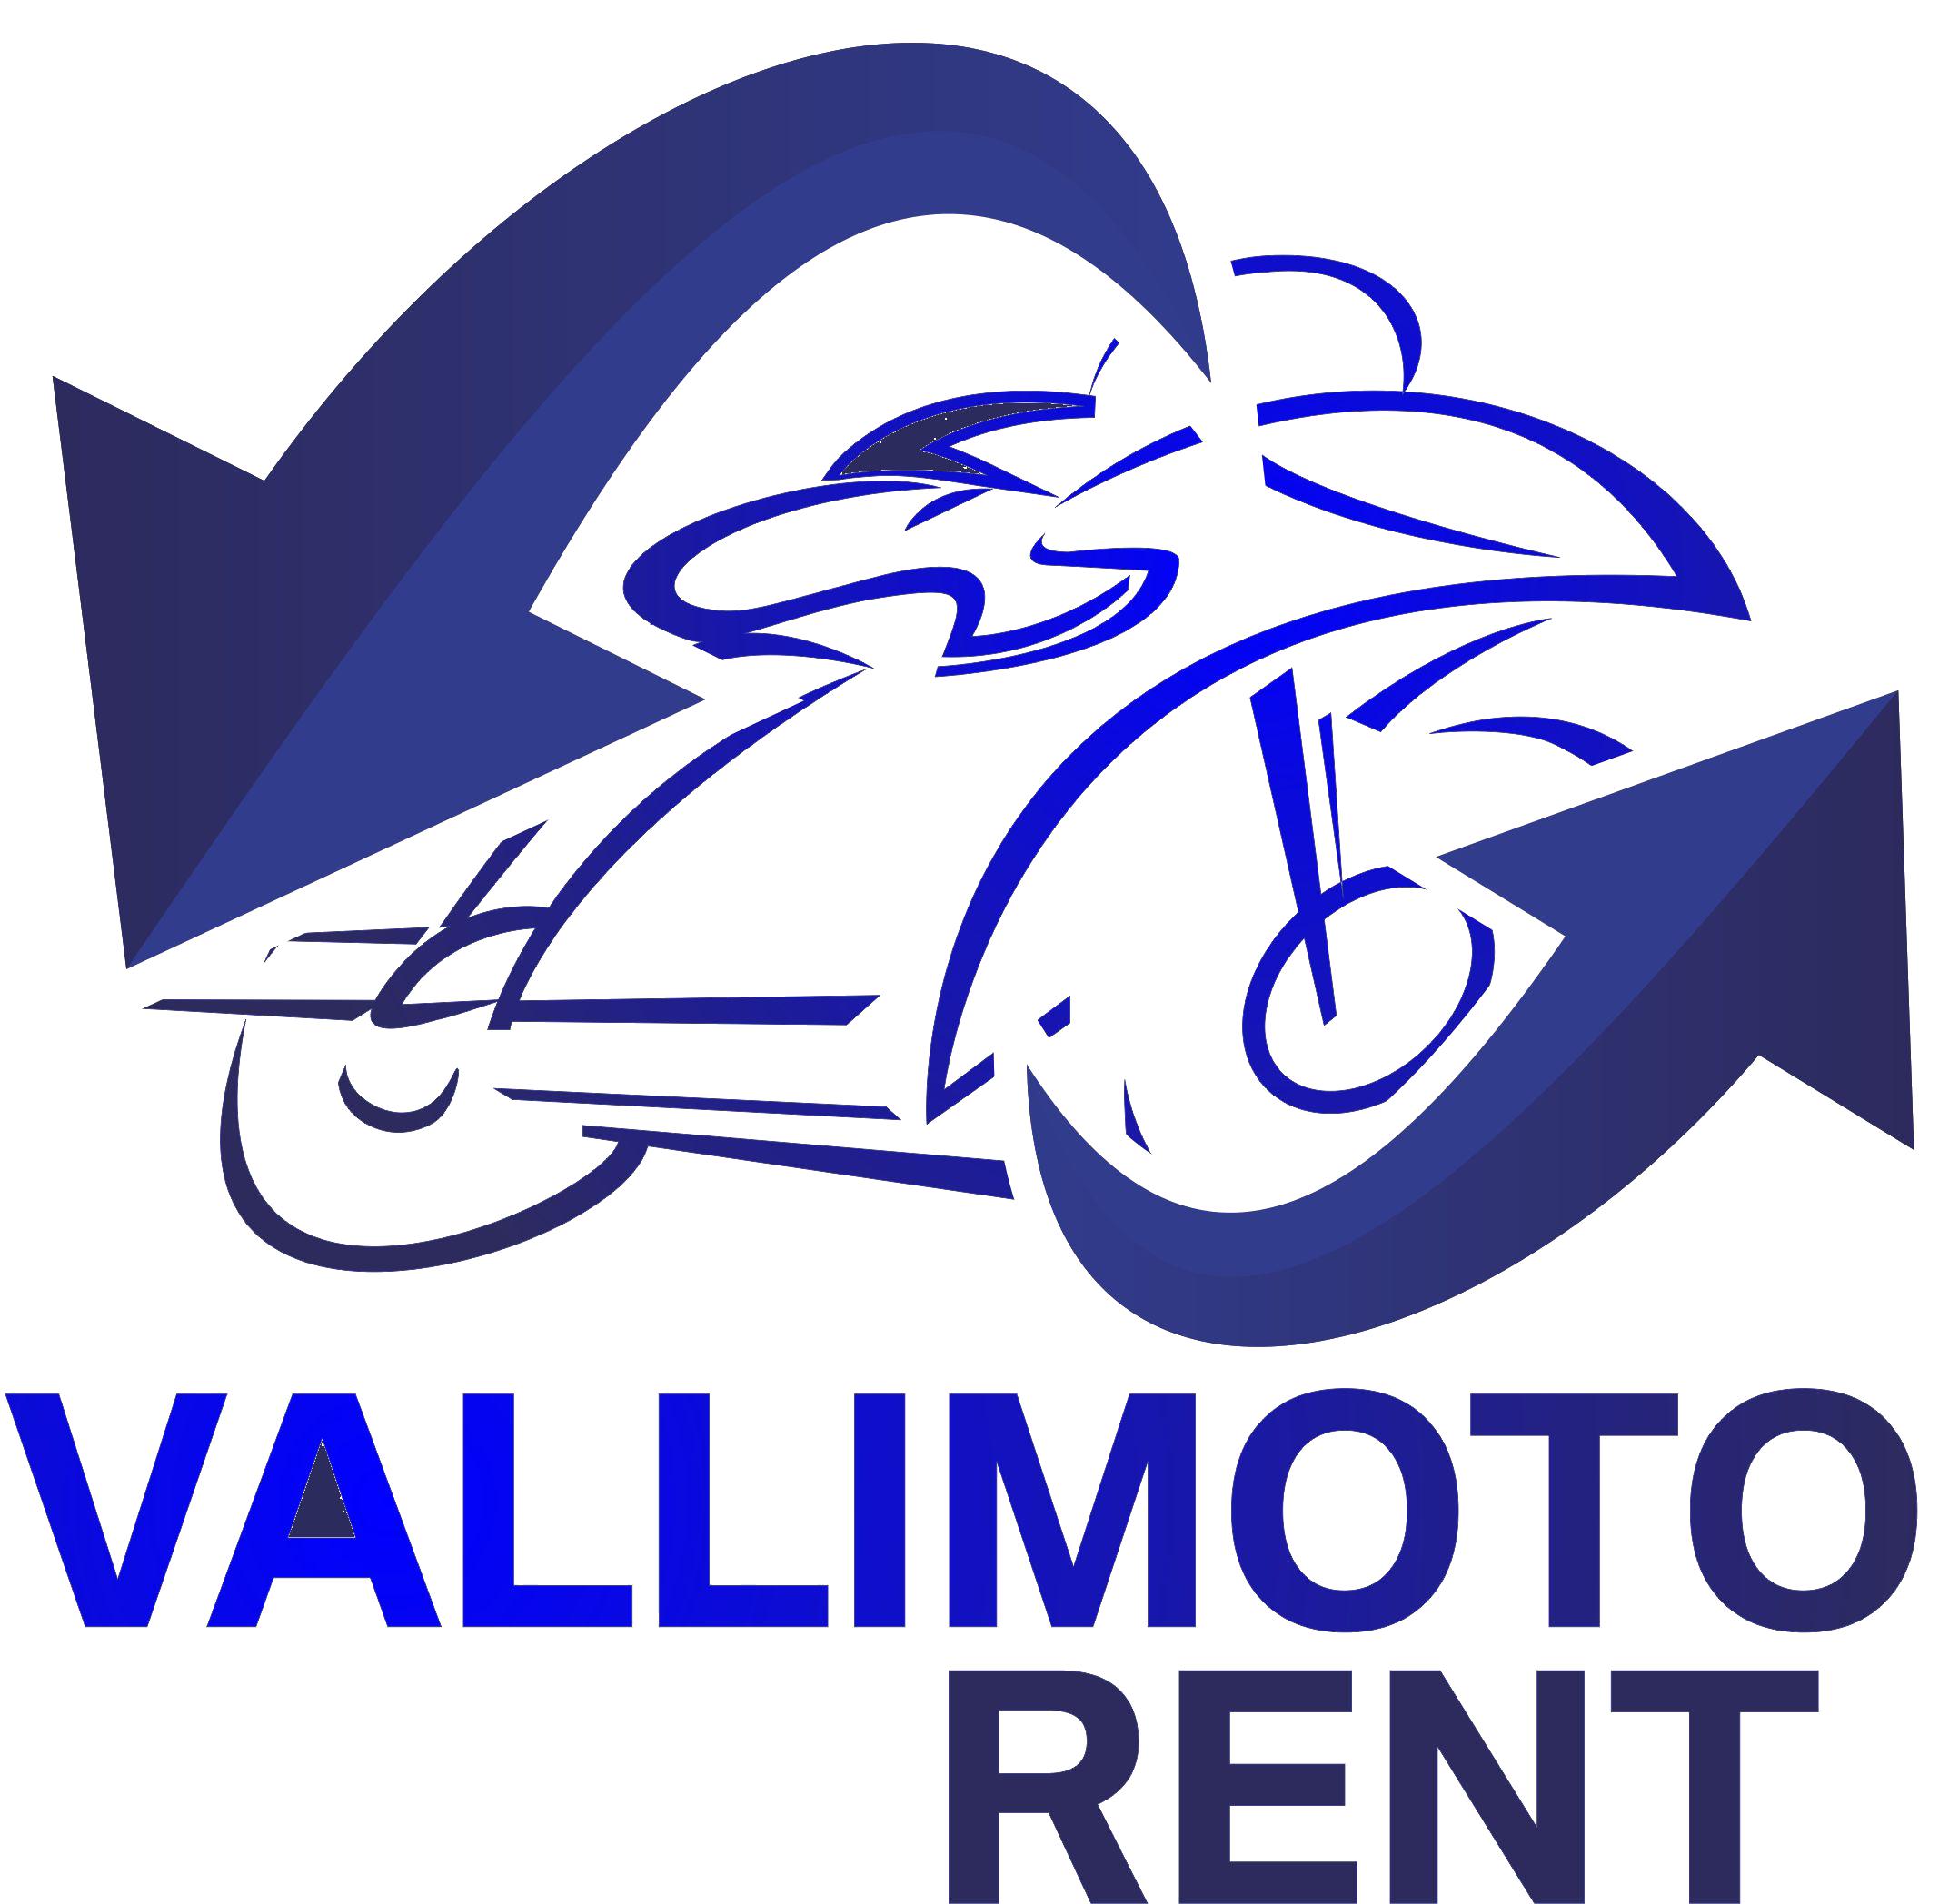 Valli Moto Rent